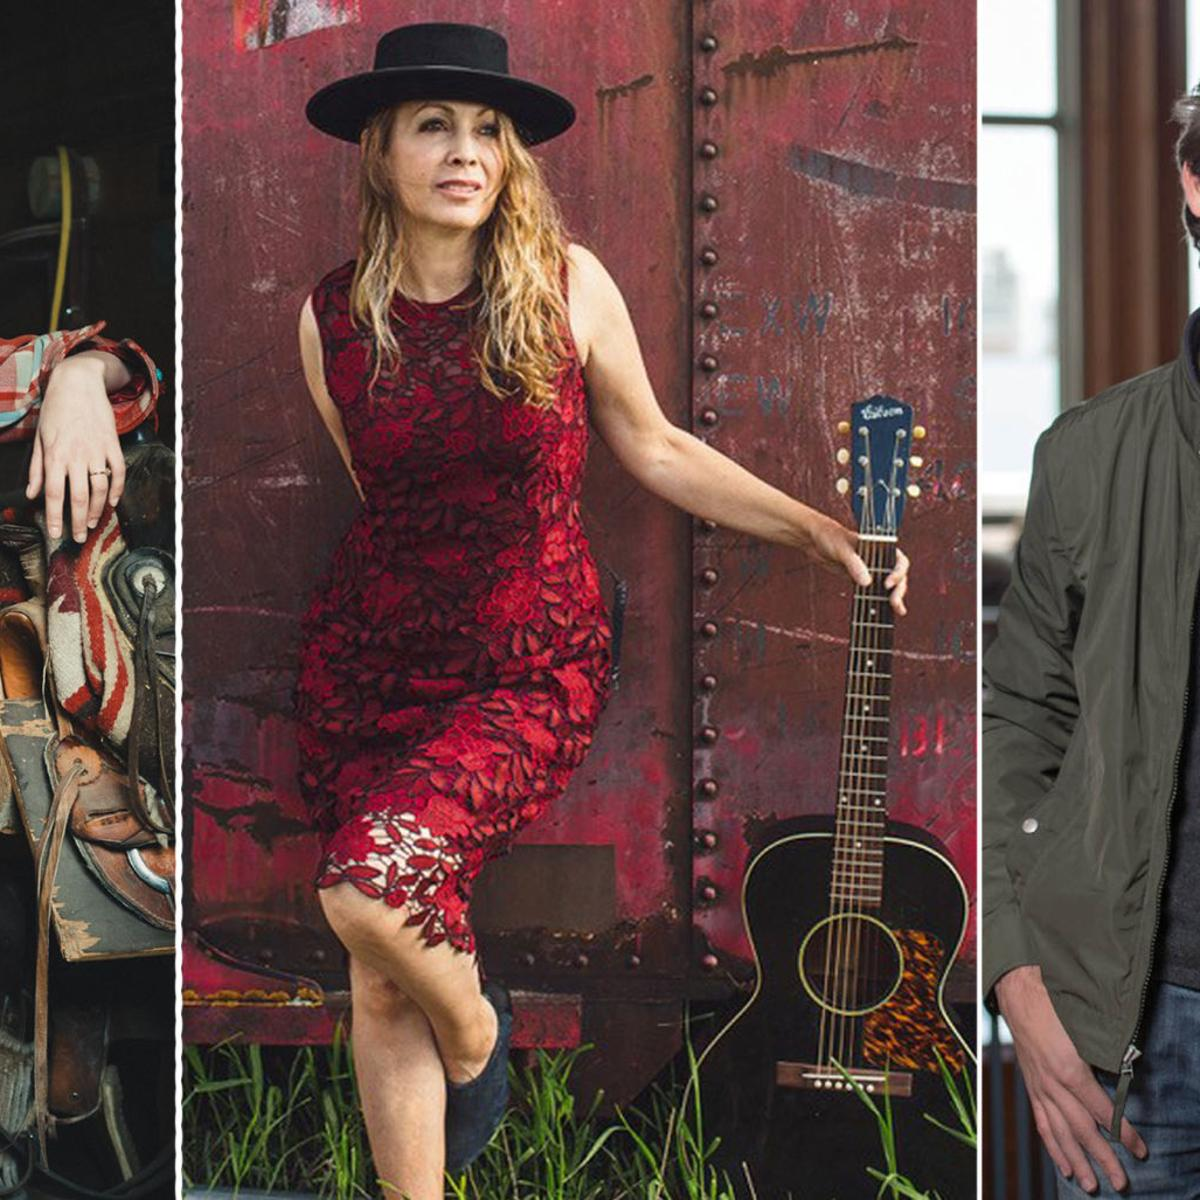 Songwriters Jessie Bridges, Audrey Hall and Sean Douglas